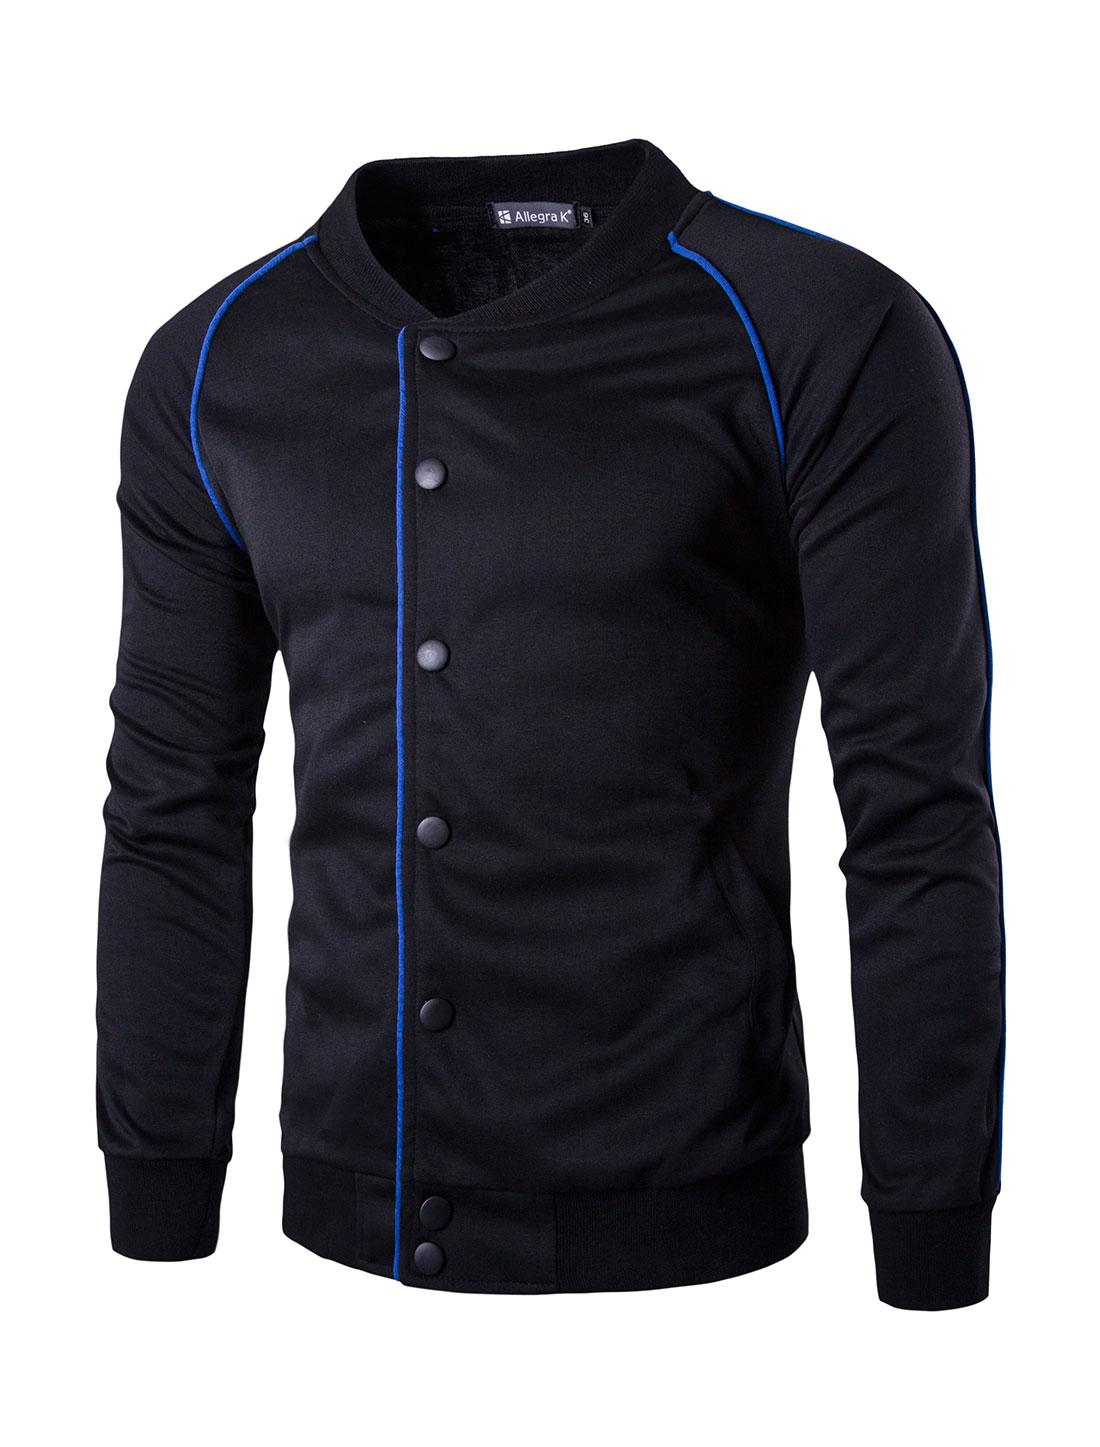 Men Snap Button Fastener Raglan Sleeves Piped Jacket Black S